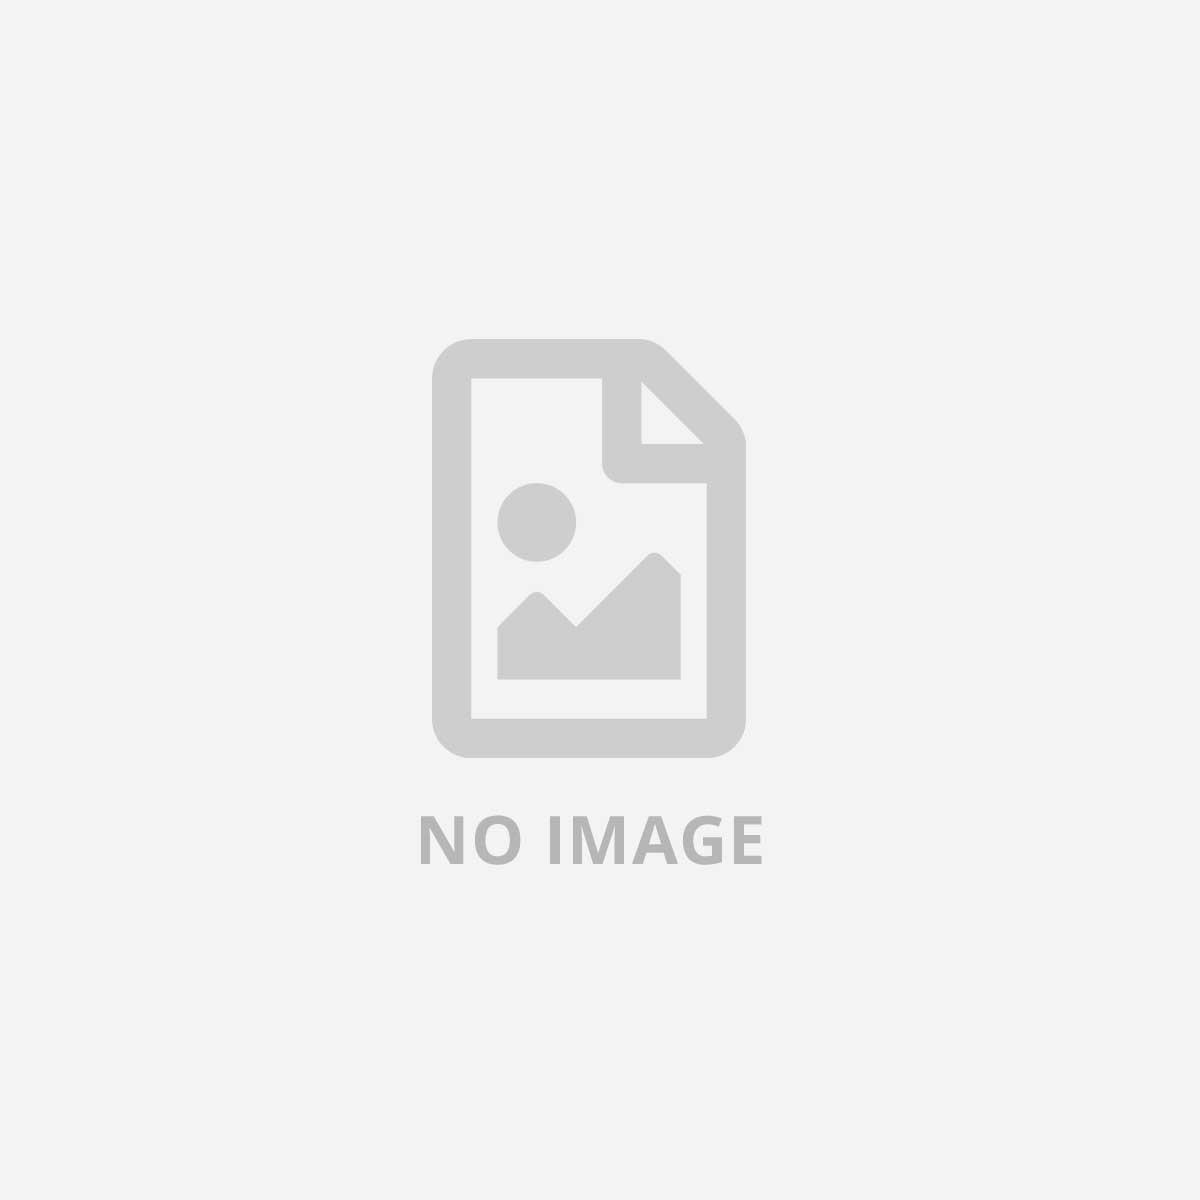 TOSHIBA USB 3.0 PORTABLE SUPERMULTI DRIVE